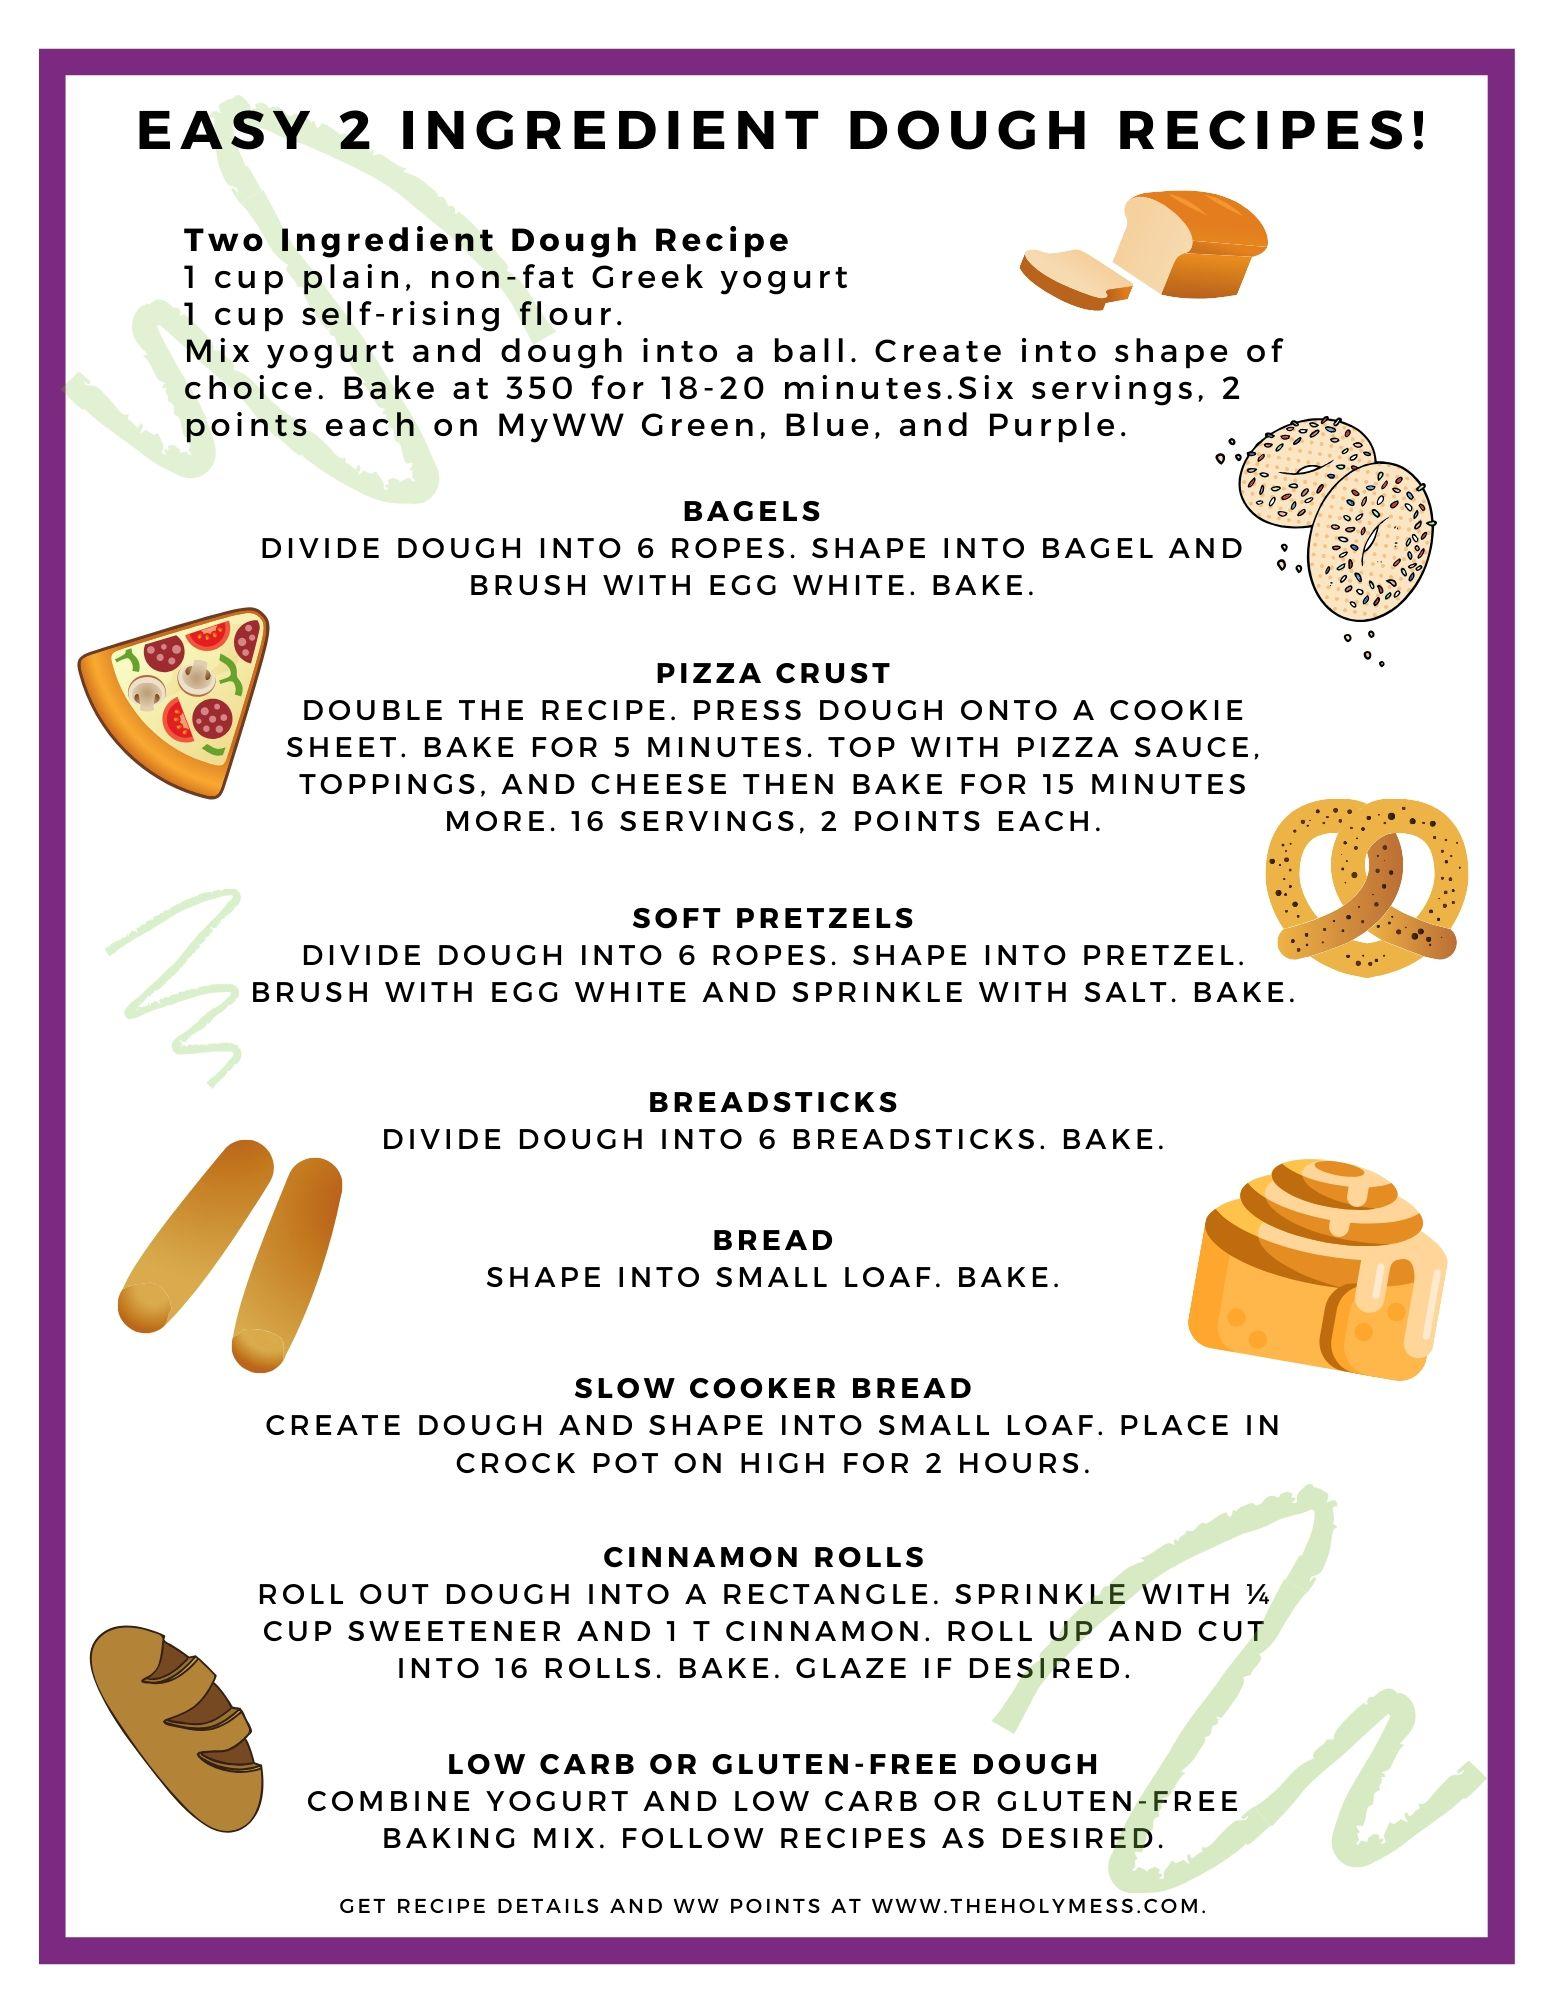 2 Ingredient Dough Recipes